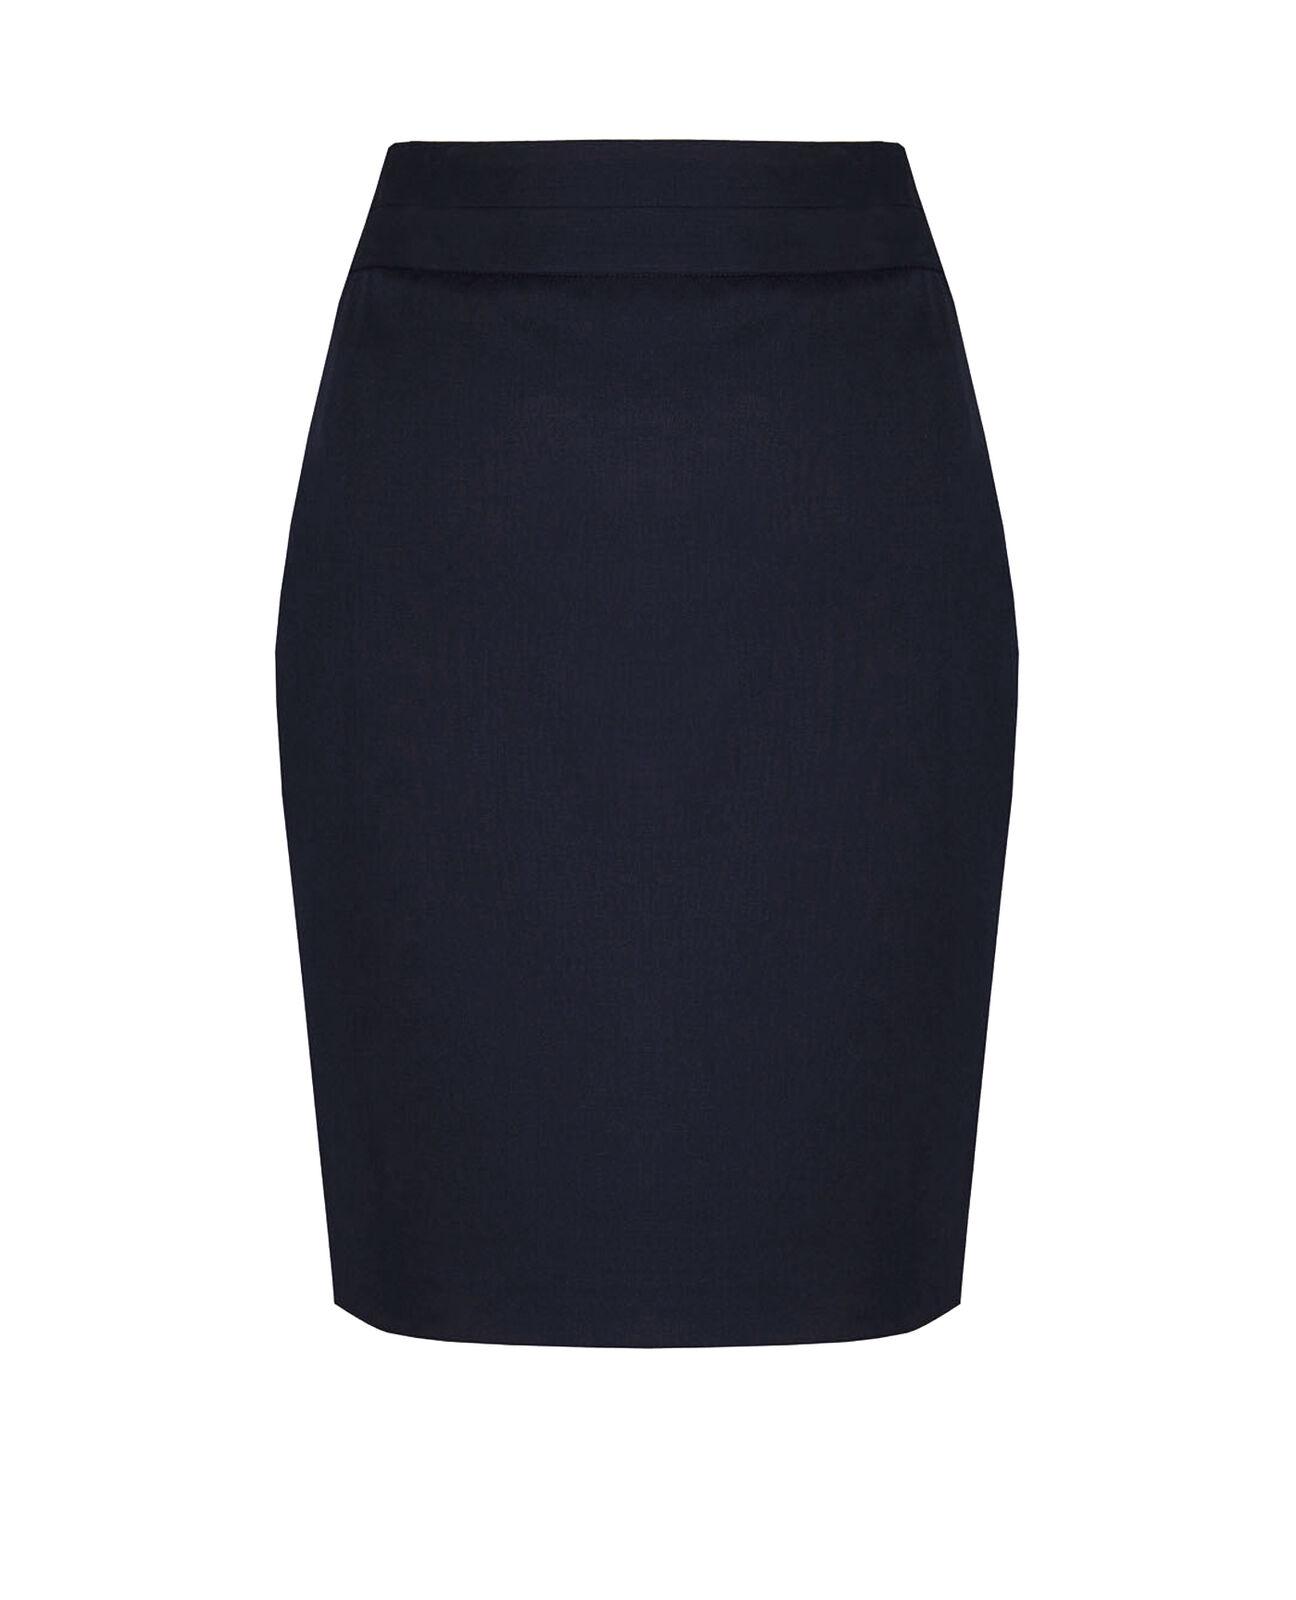 BNWT Womens M/&S Size 18 Copper /& Navy Stretch Skirt 18 inch